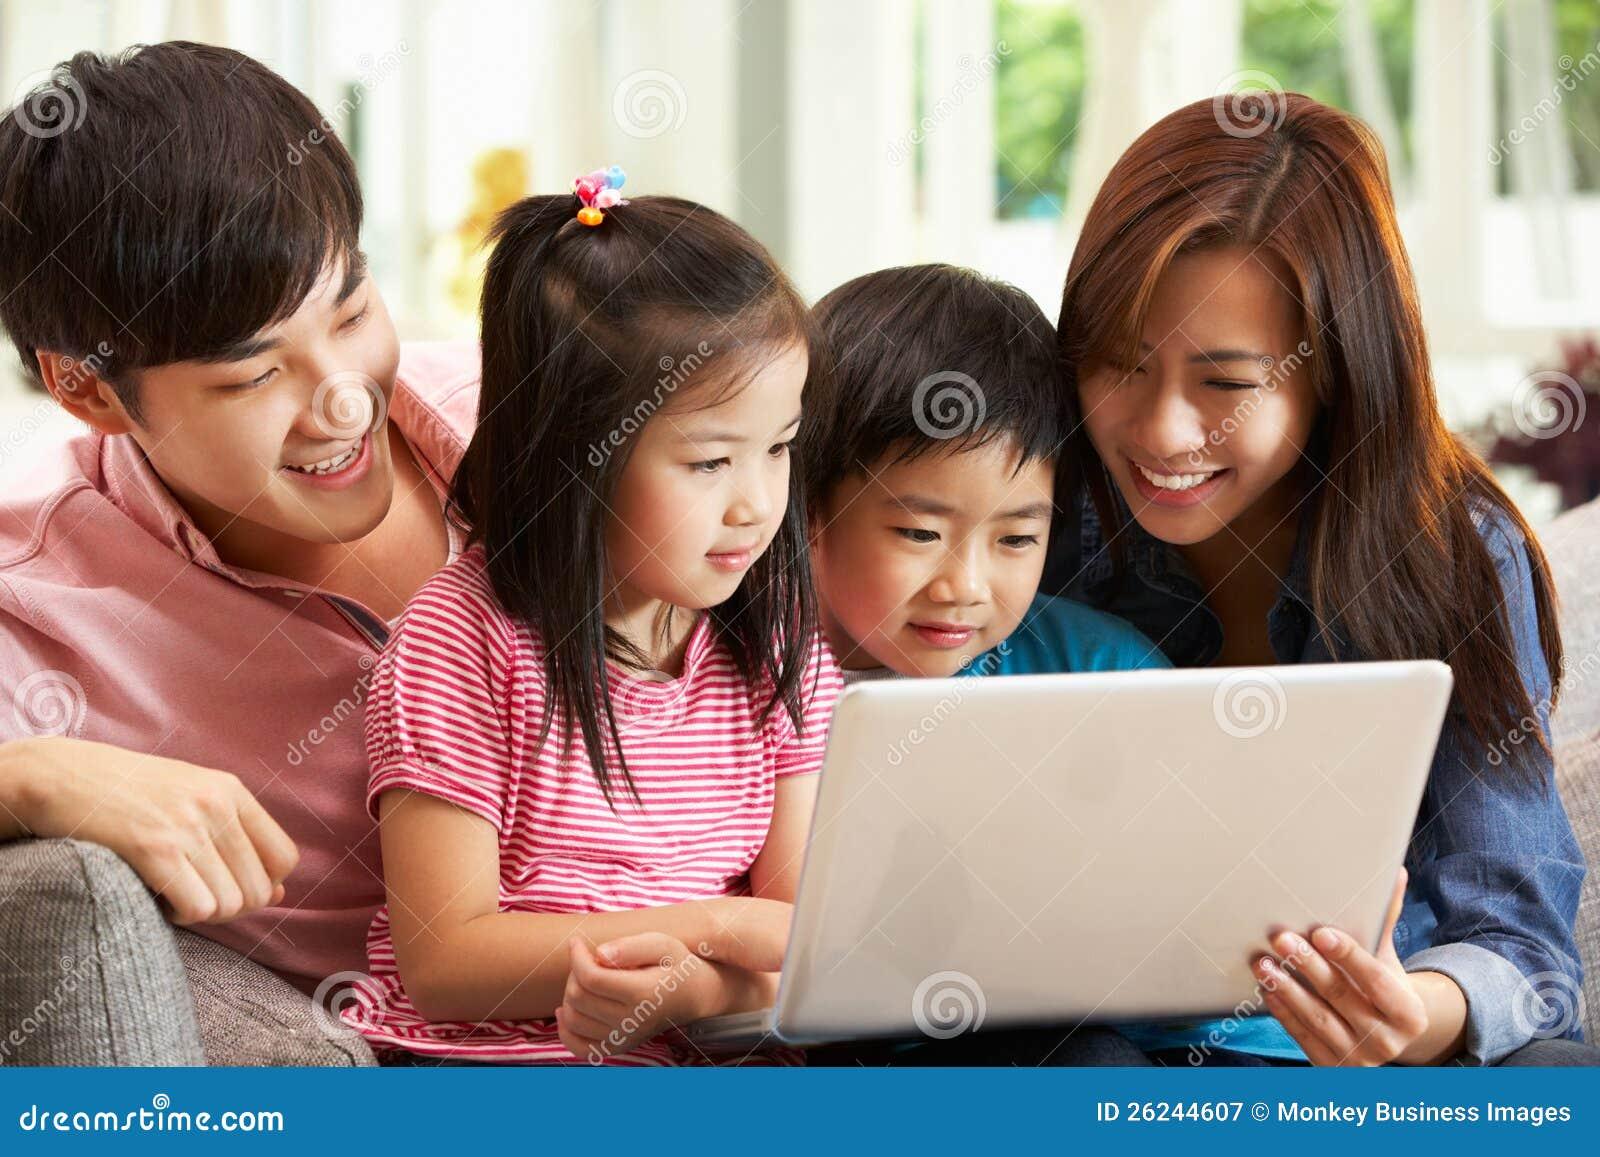 Familia china usando la computadora portátil mientras que se relaja